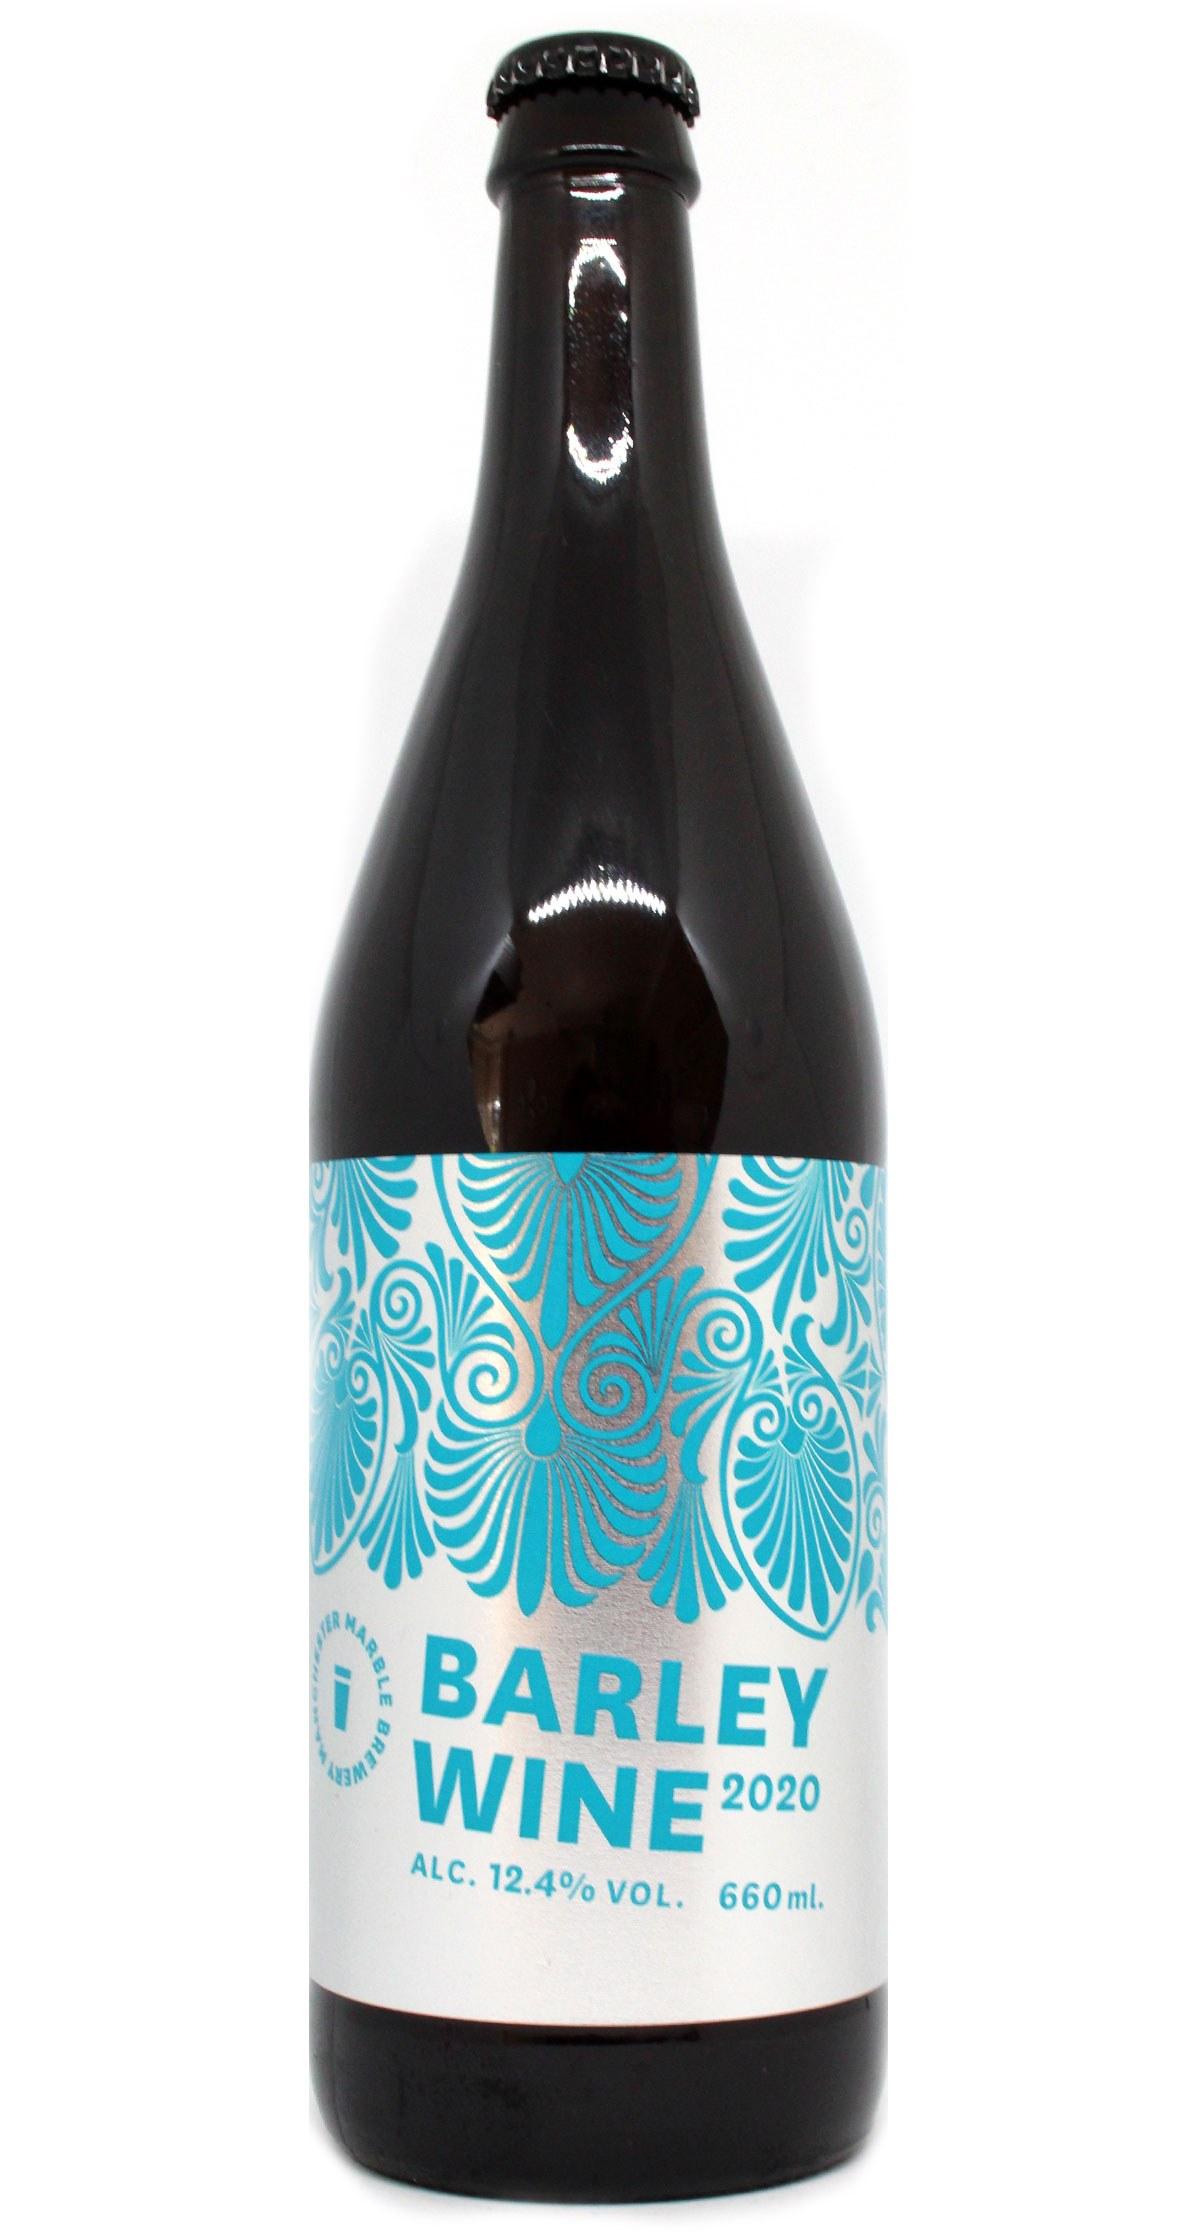 Barley Wine 2020